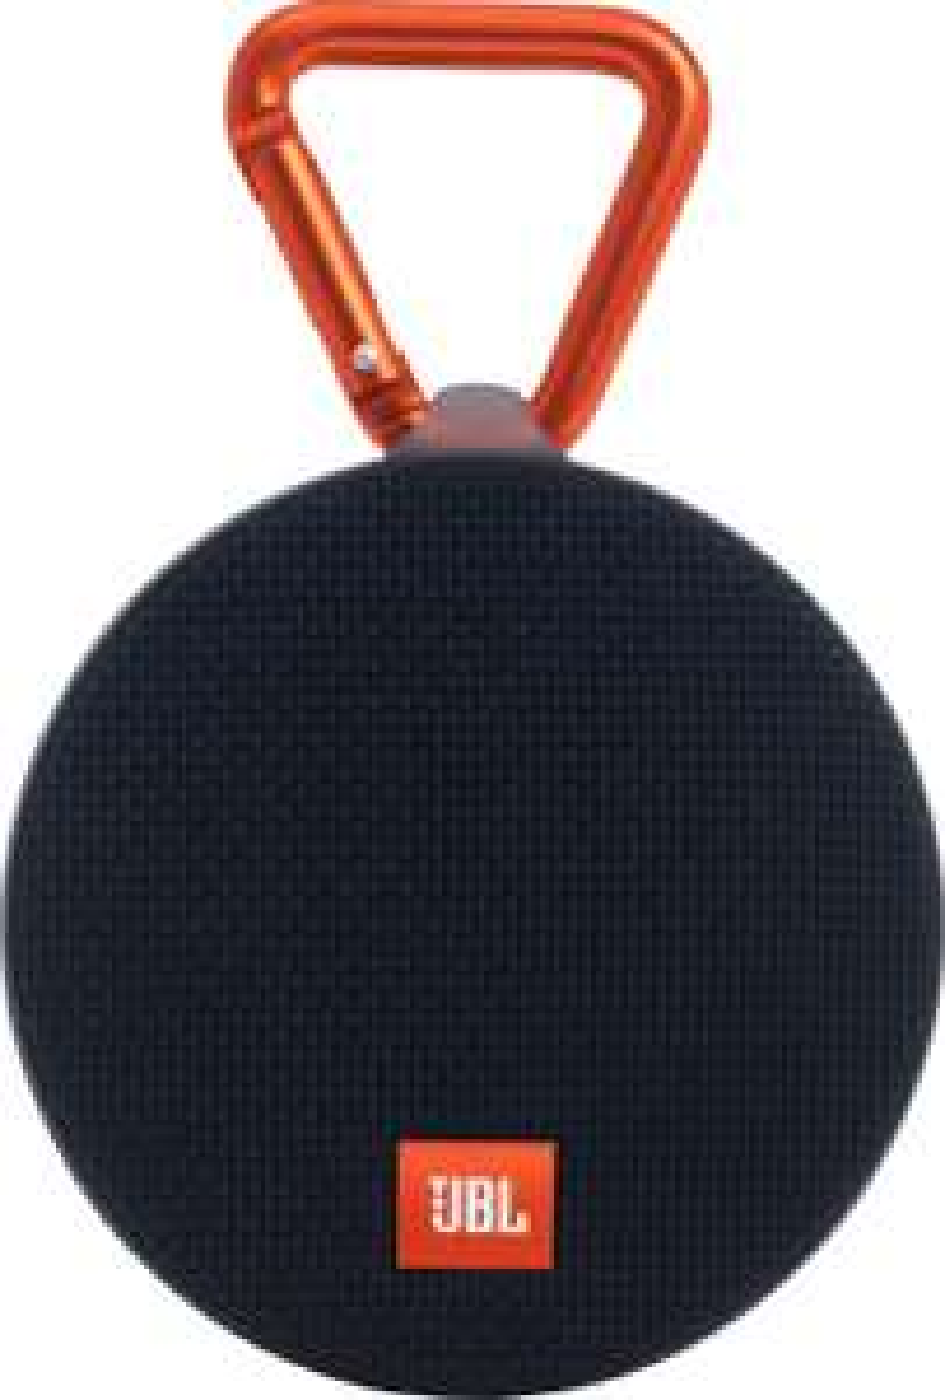 Enceinte Bluetooth JBL Clip 2 - noir